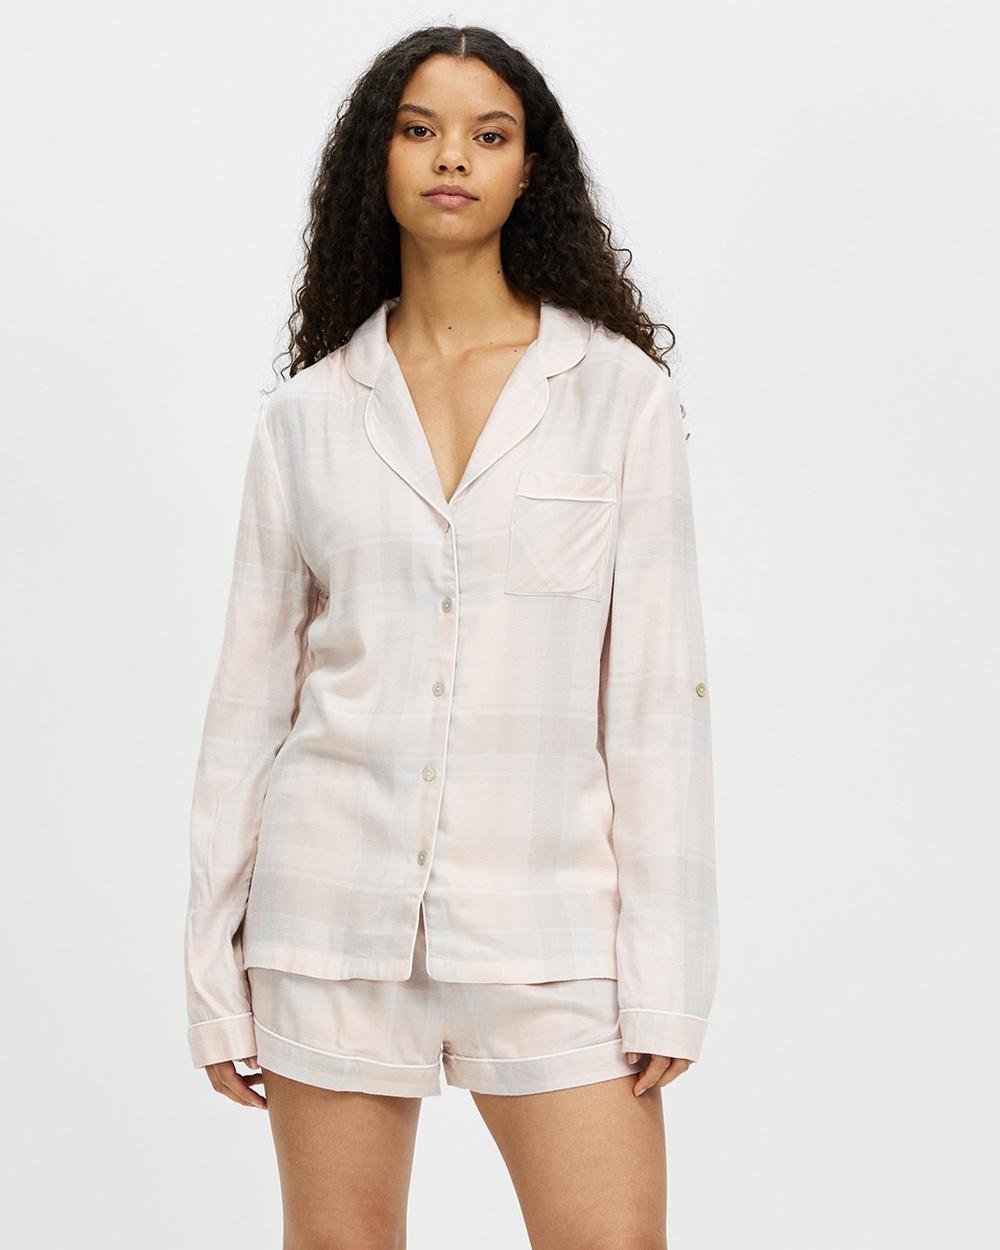 Homebodii Ardelia Long Sleeve With Shorts PJ Set Two-piece sets Blush